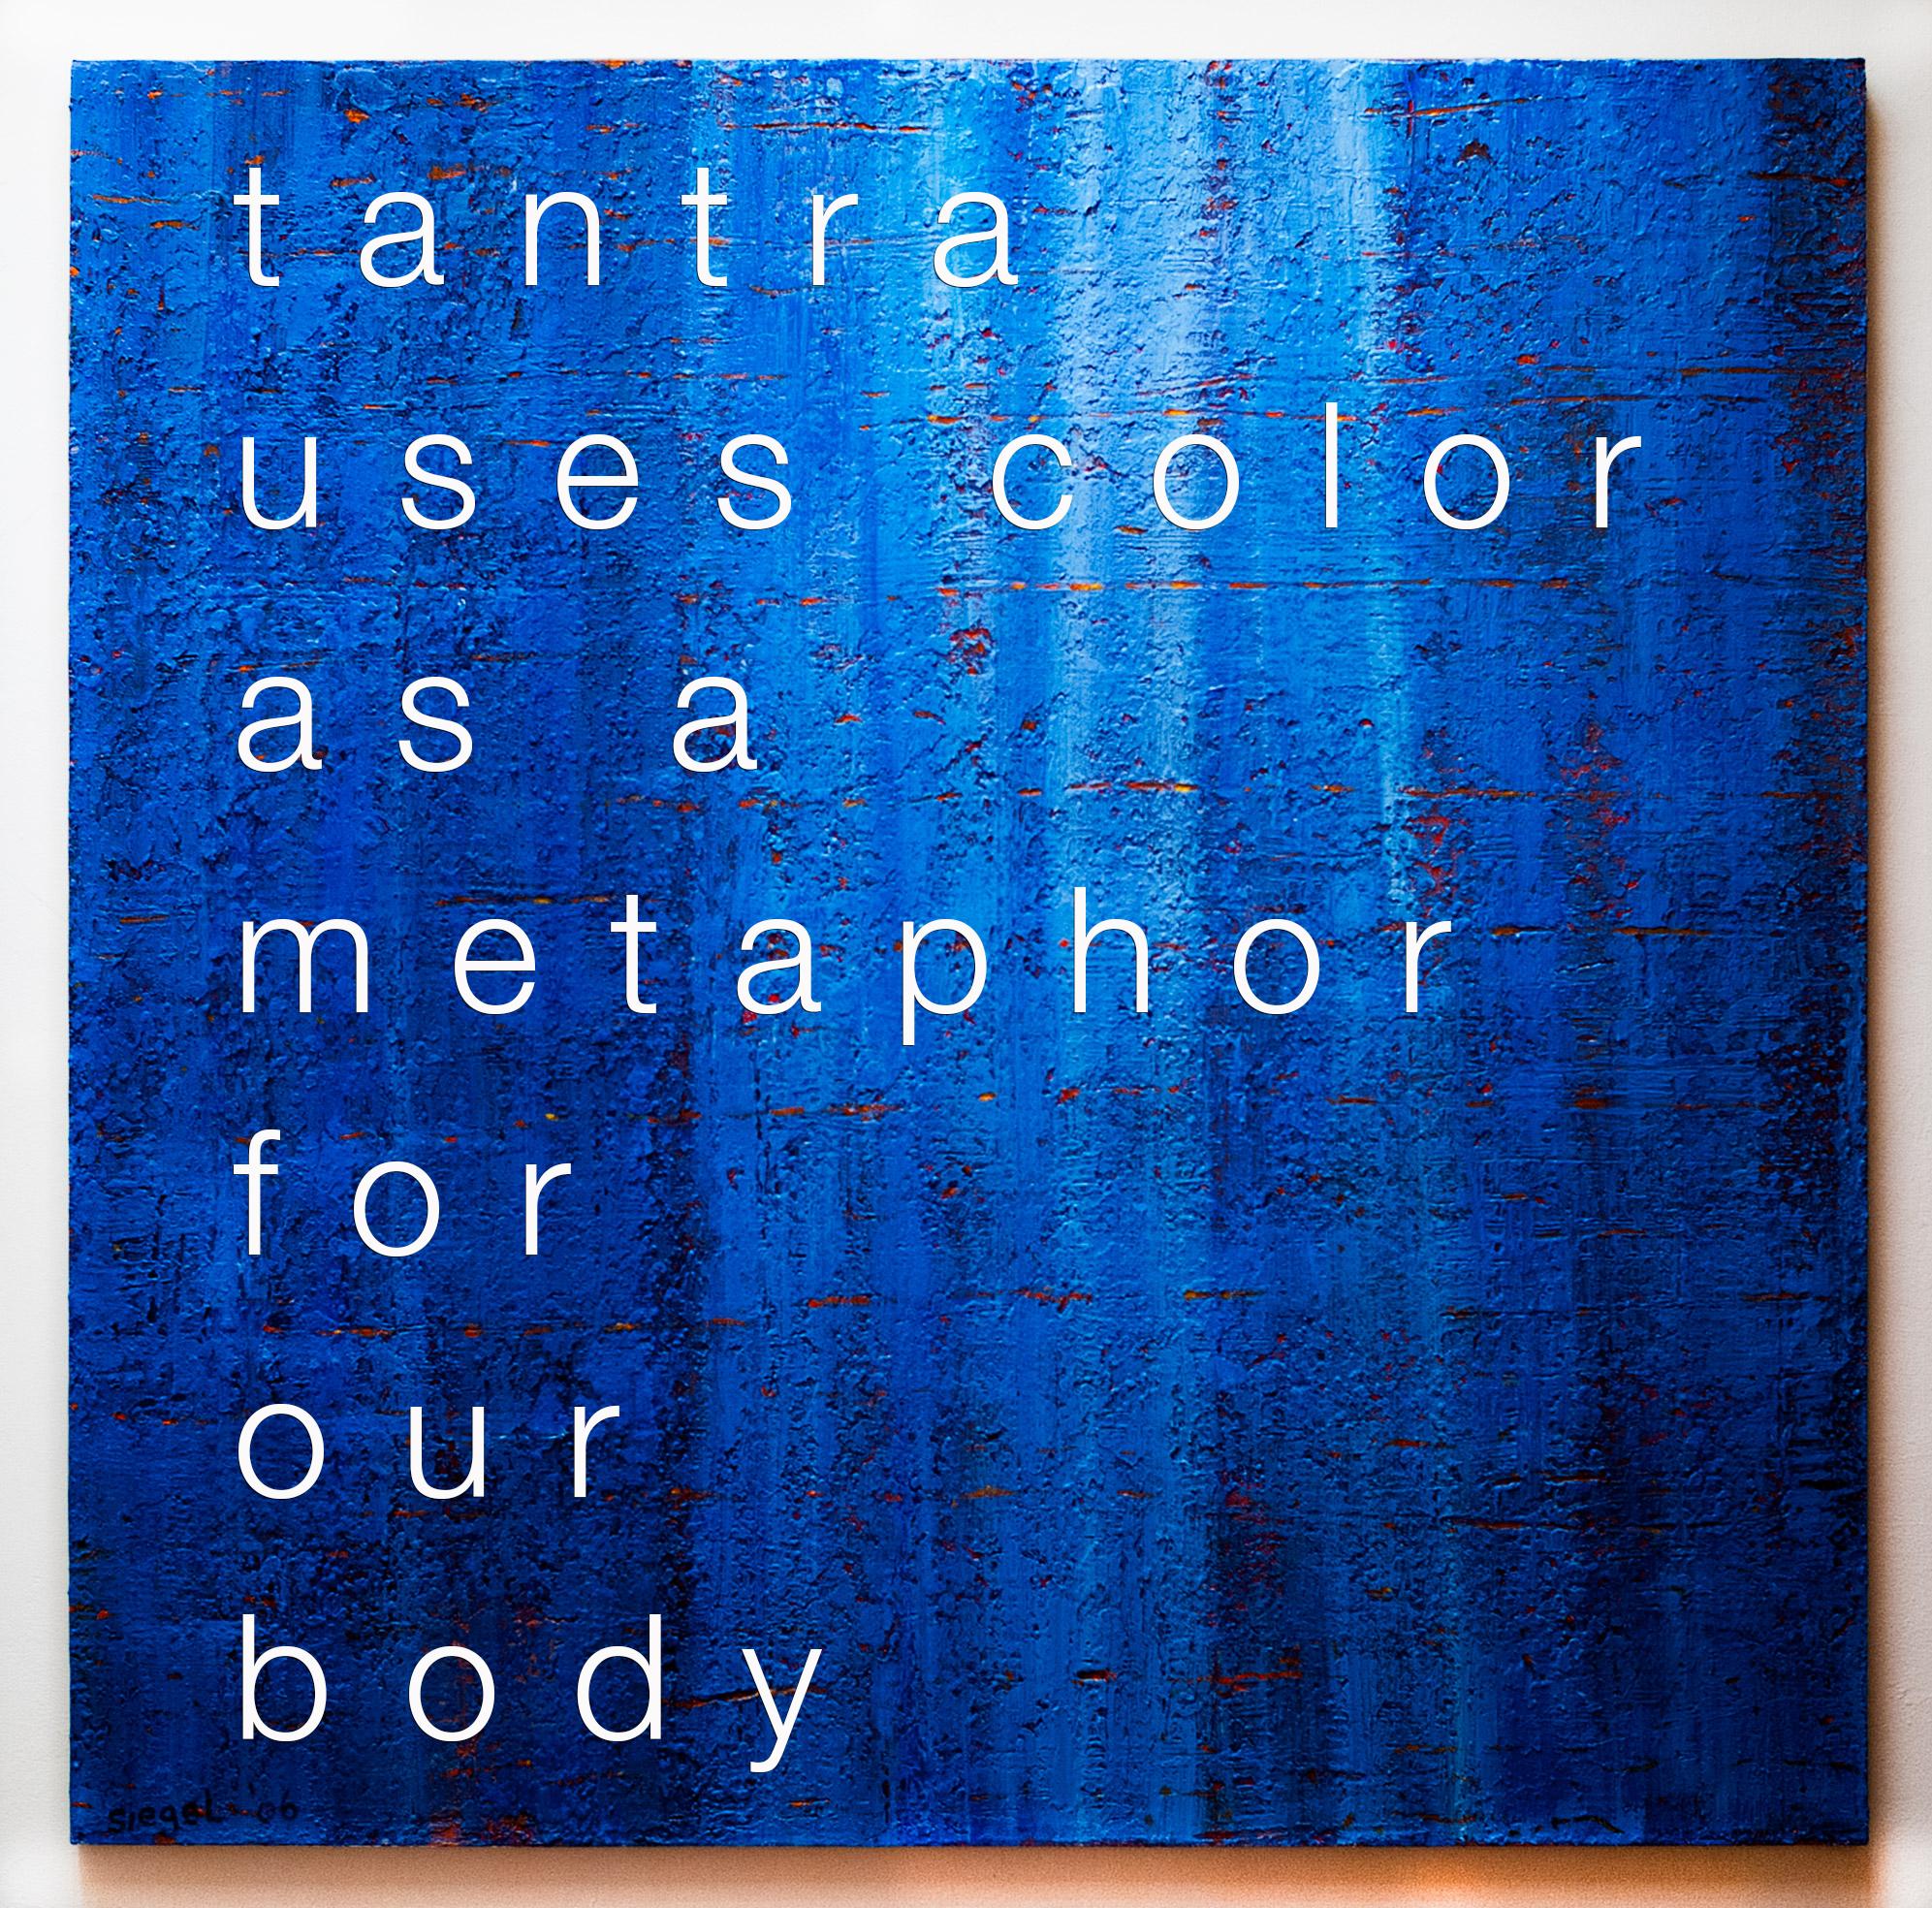 tantra_text_blue_4.jpg